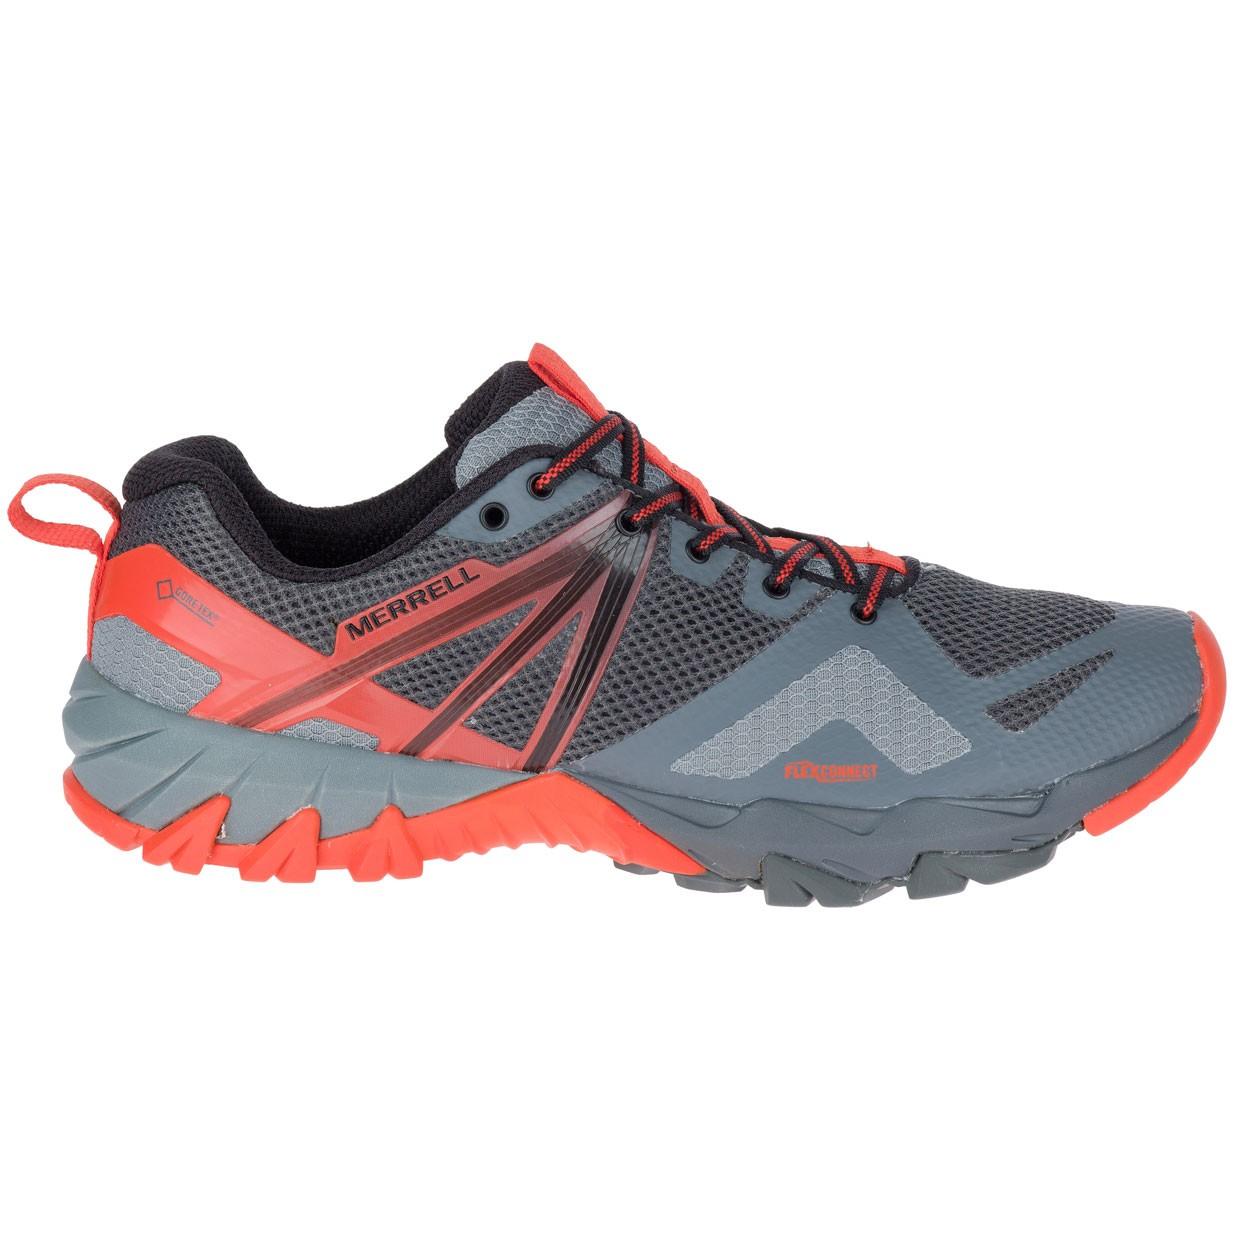 Merrell MQM Flex GTX M - Scarpe da trail running - compra online a Sport  Gardena 829d1734432